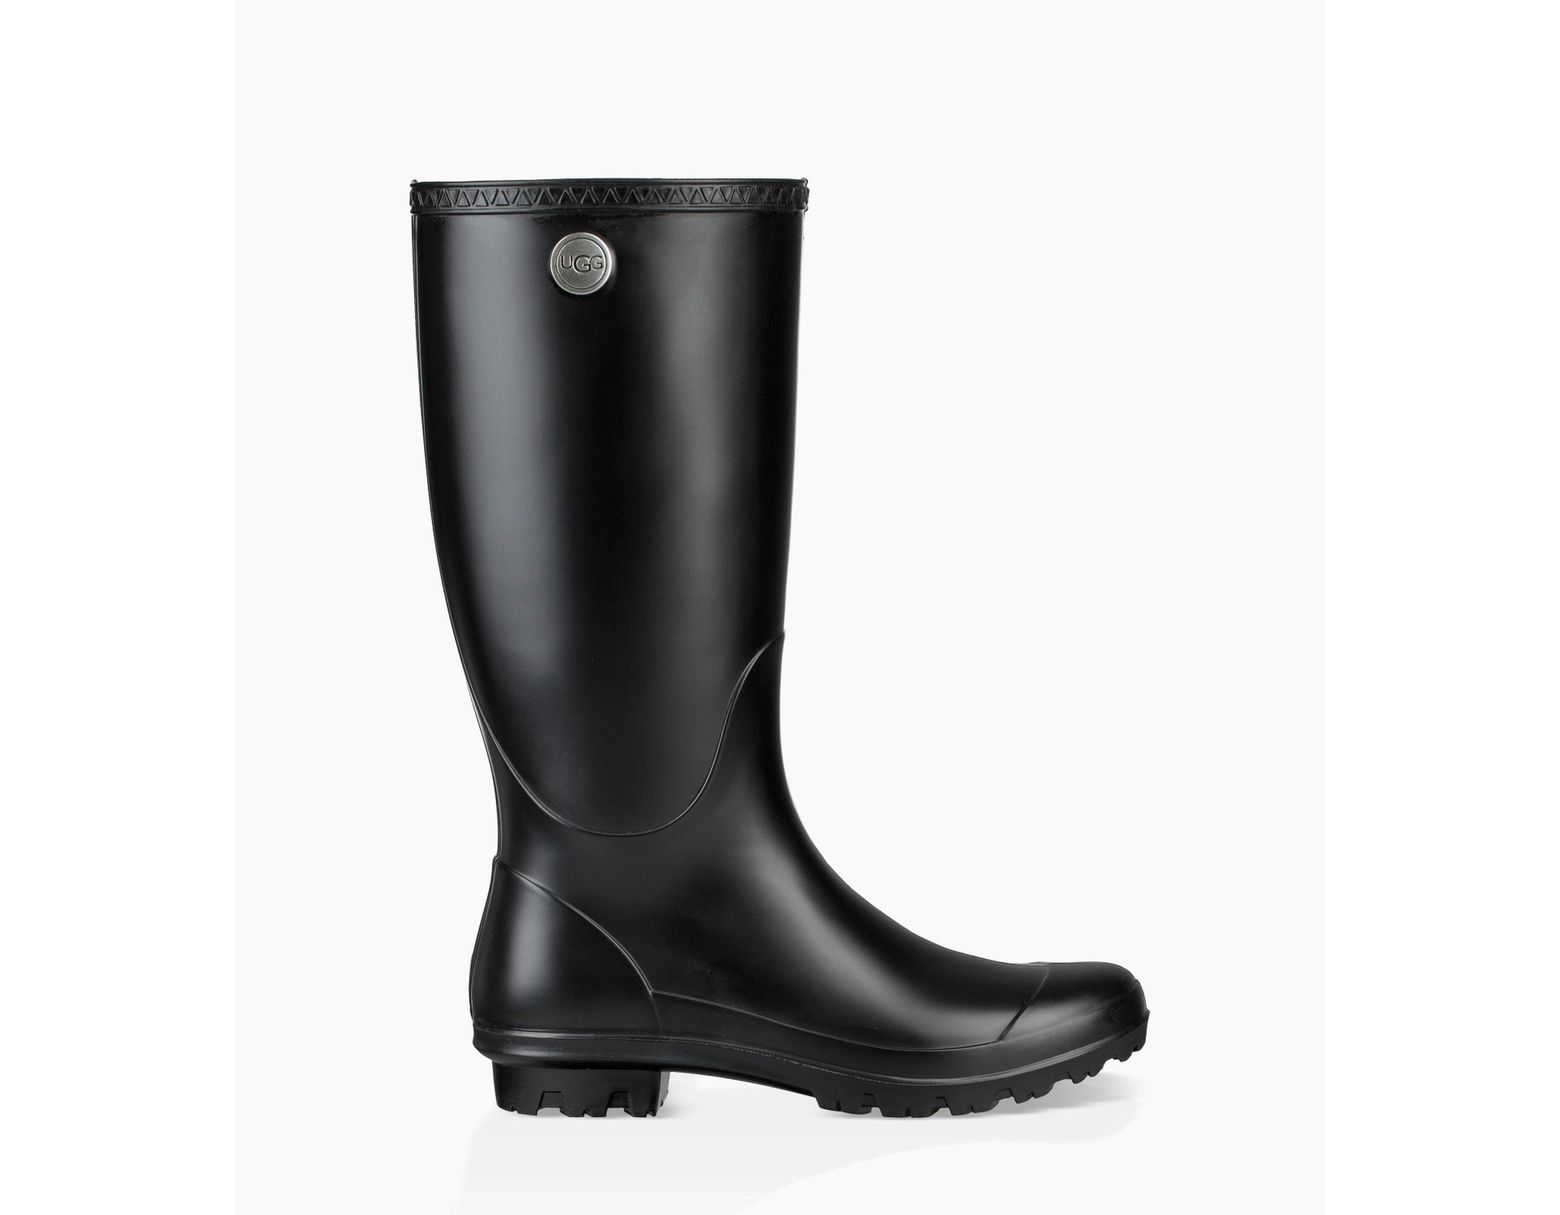 80772825515 Women's Black Shelby Matte Rain Boots